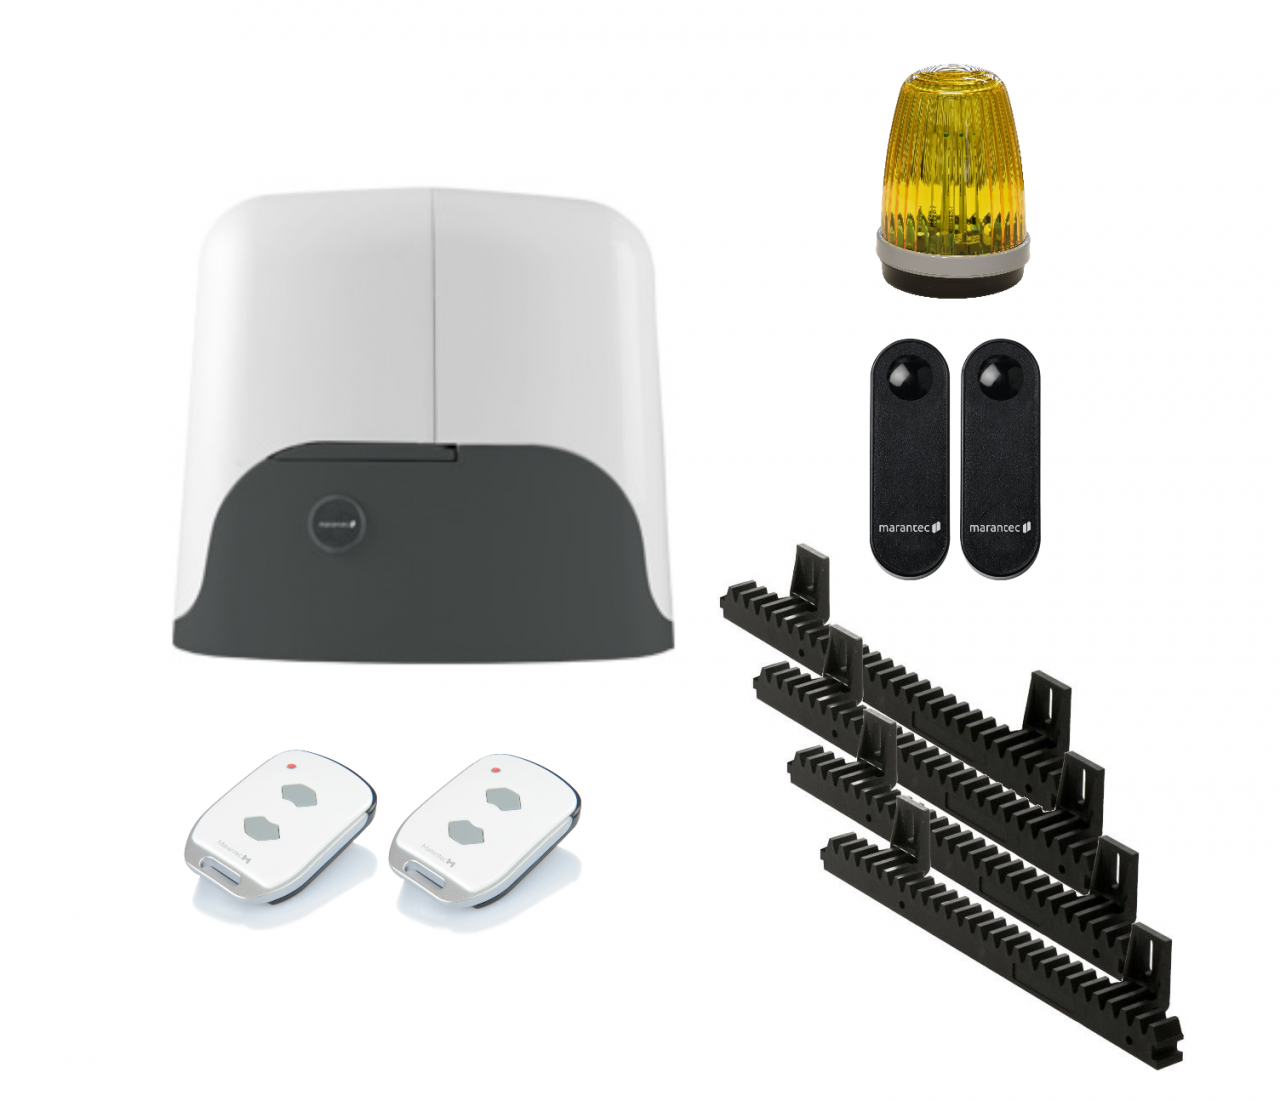 Marantec Comfort SU500F Kit Fastline Schiebetorantrieb Komplettset